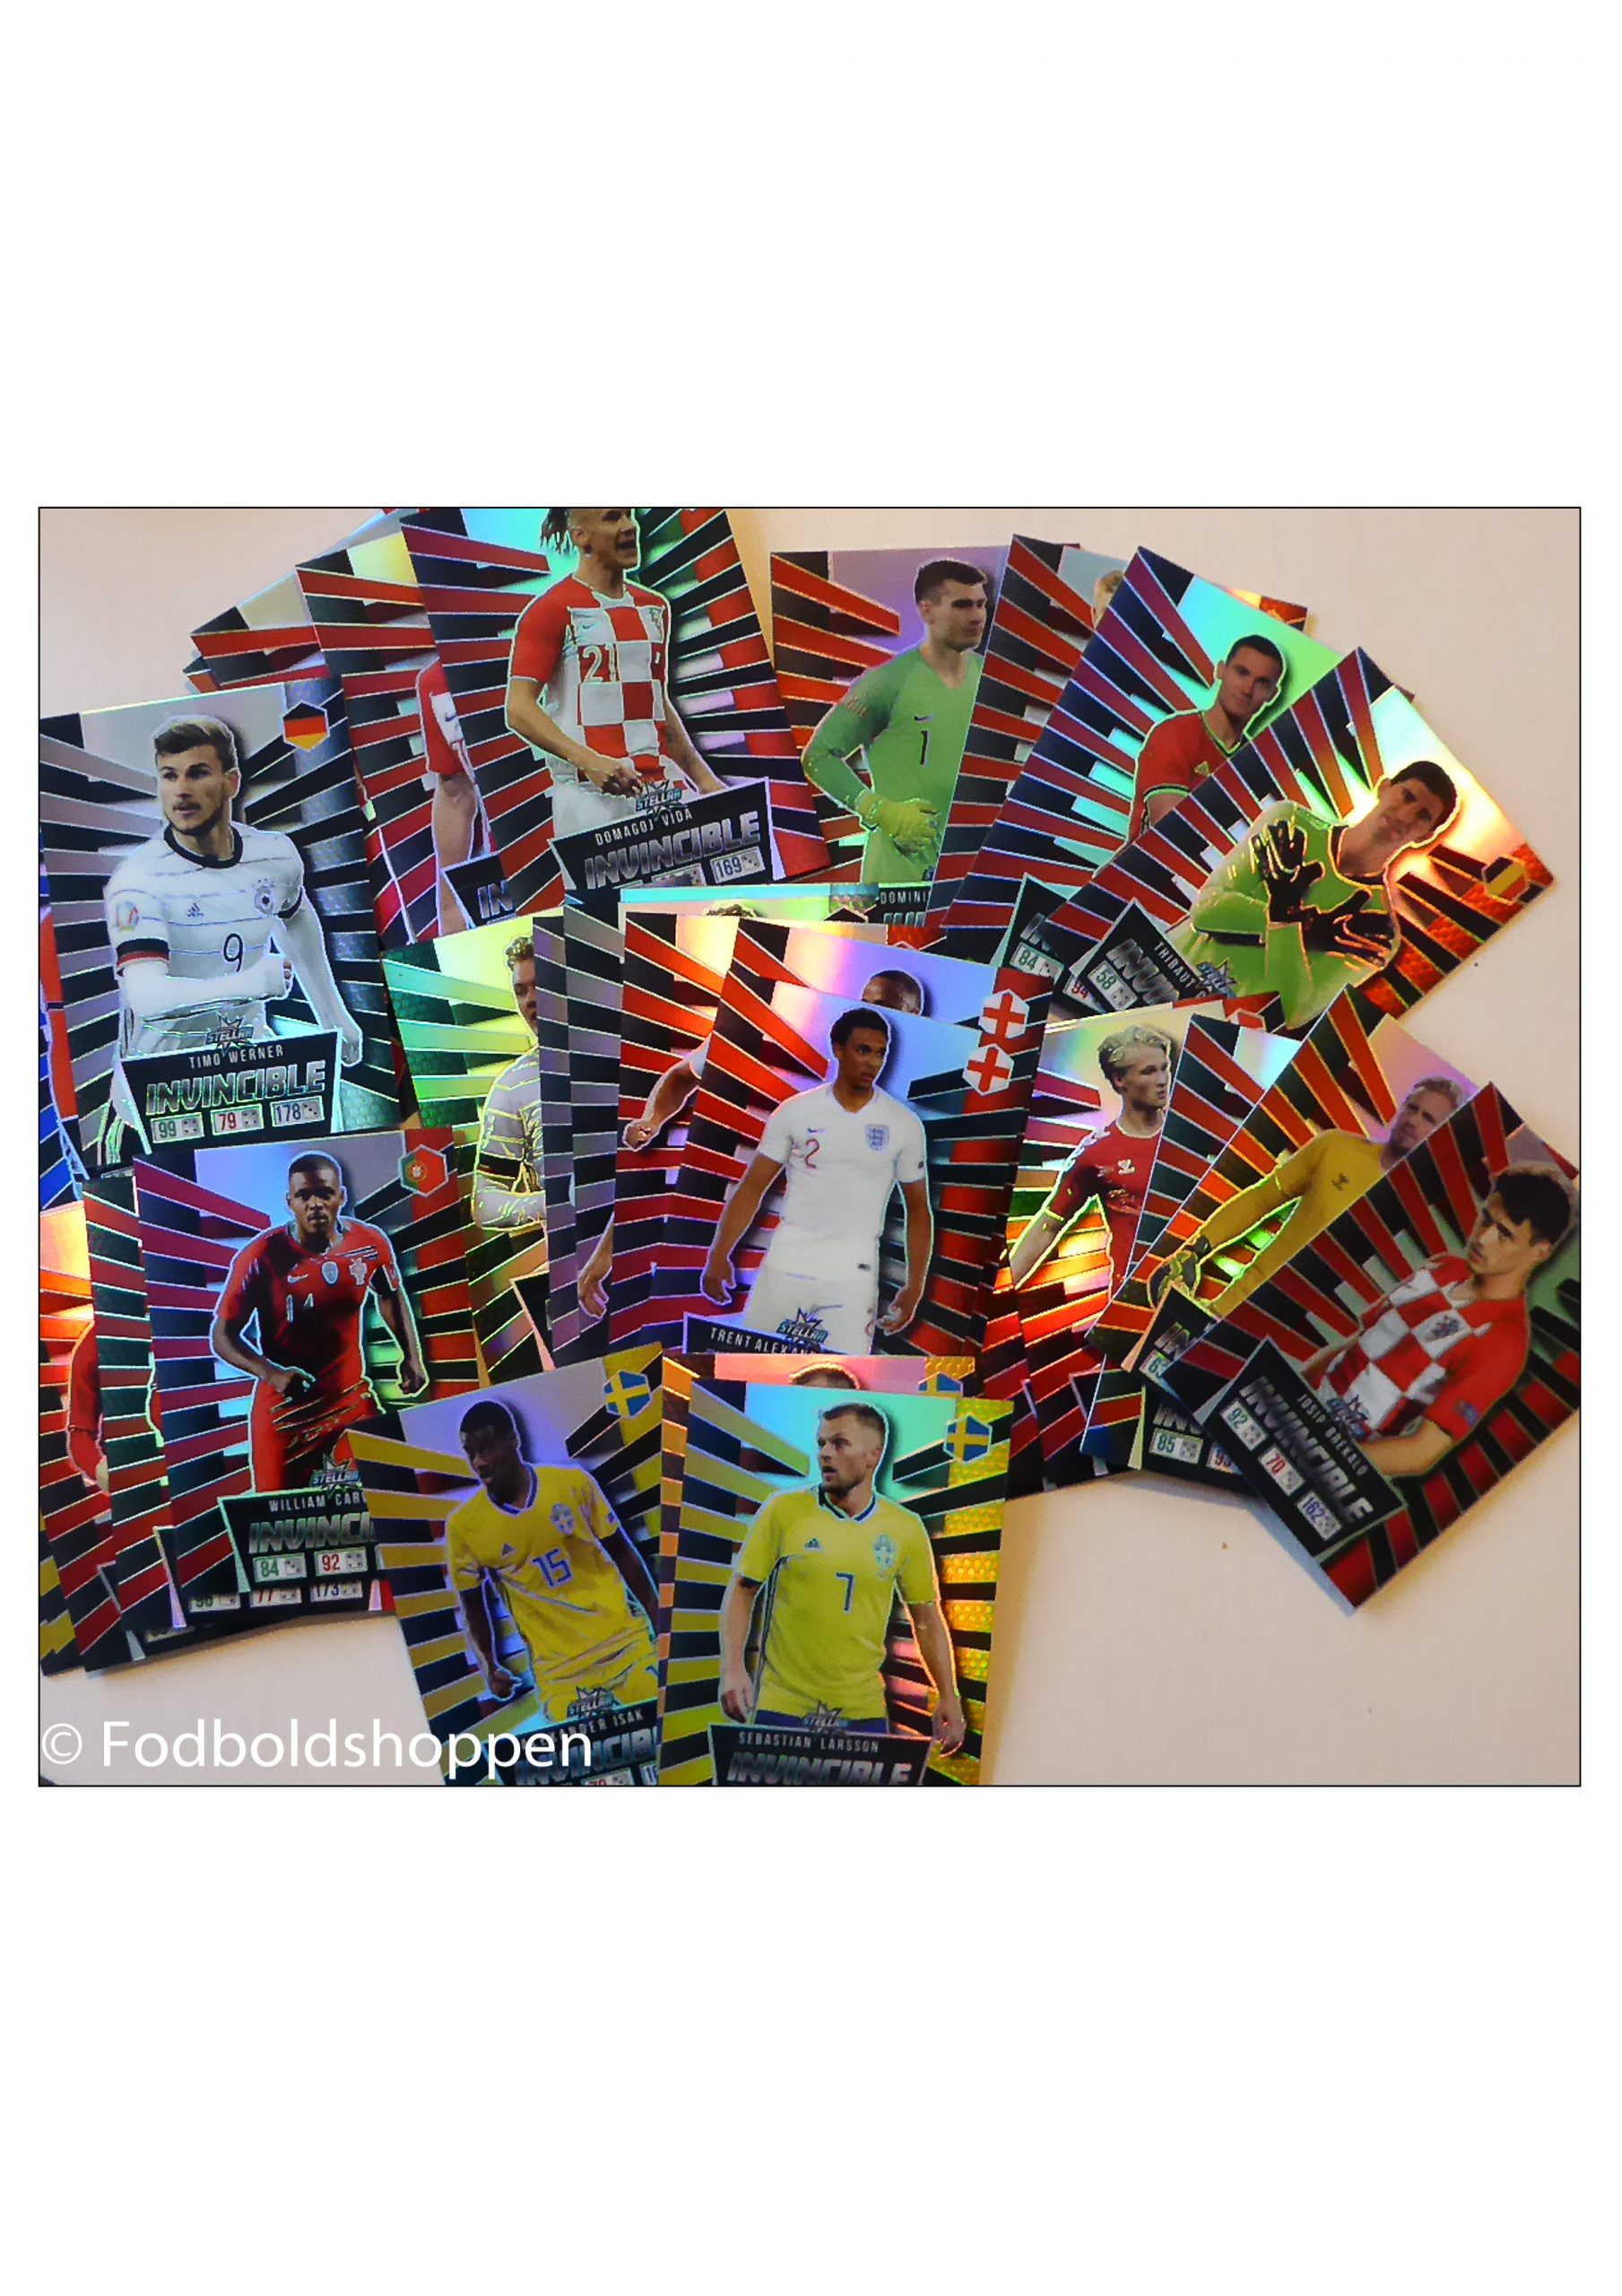 Fodboldfest Fodboldkort fra Bilka / Føtes - Stellar kort ( S- kort)